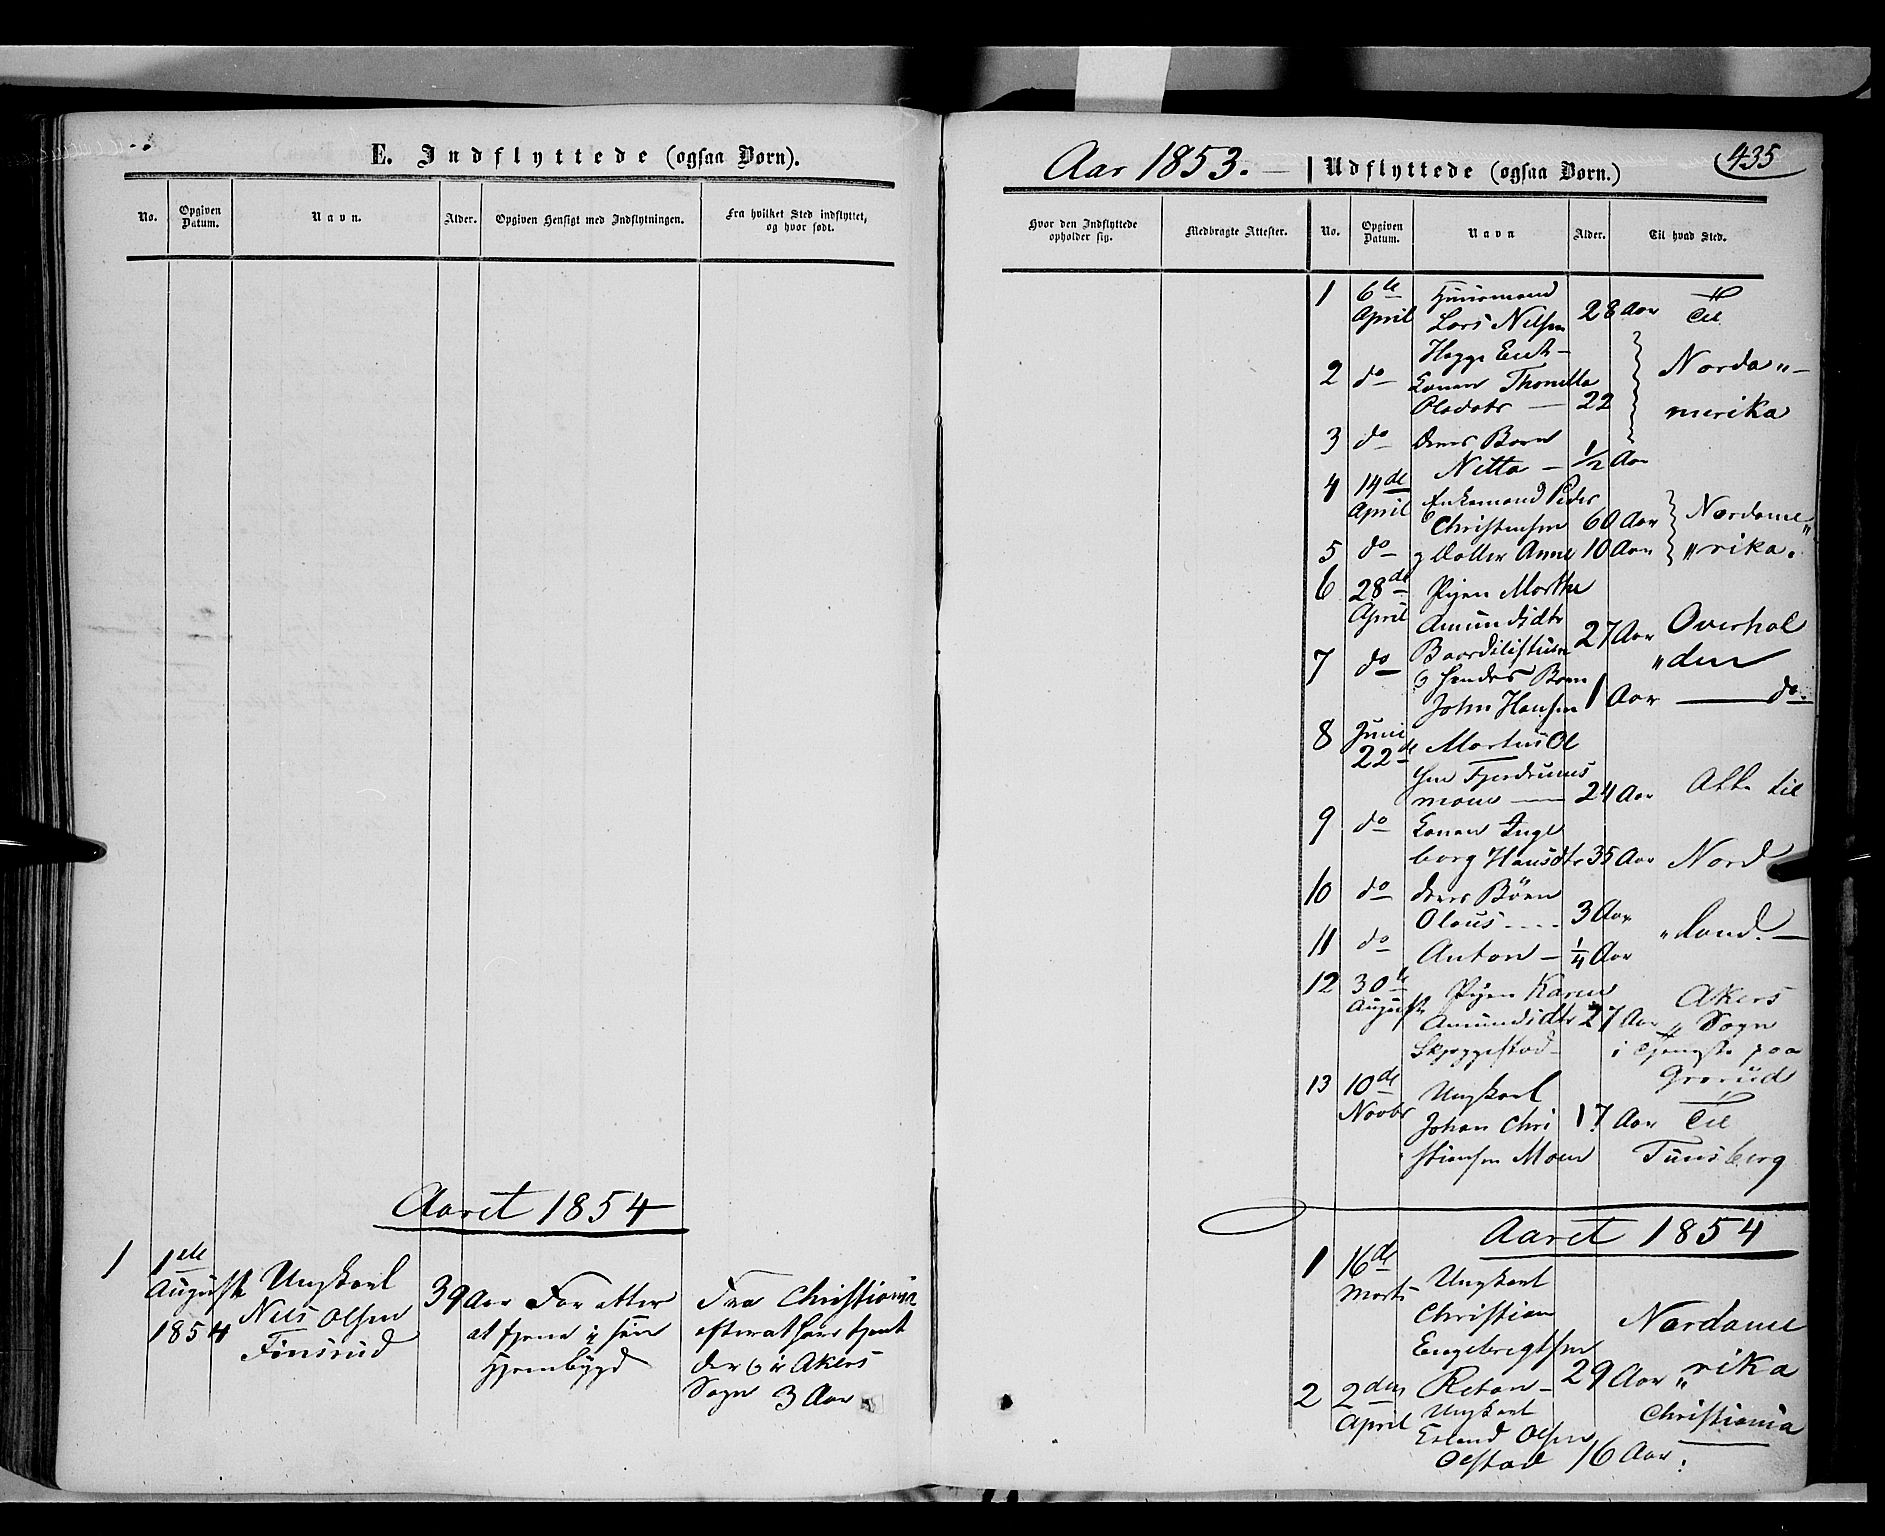 SAH, Gausdal prestekontor, Ministerialbok nr. 8, 1850-1861, s. 435